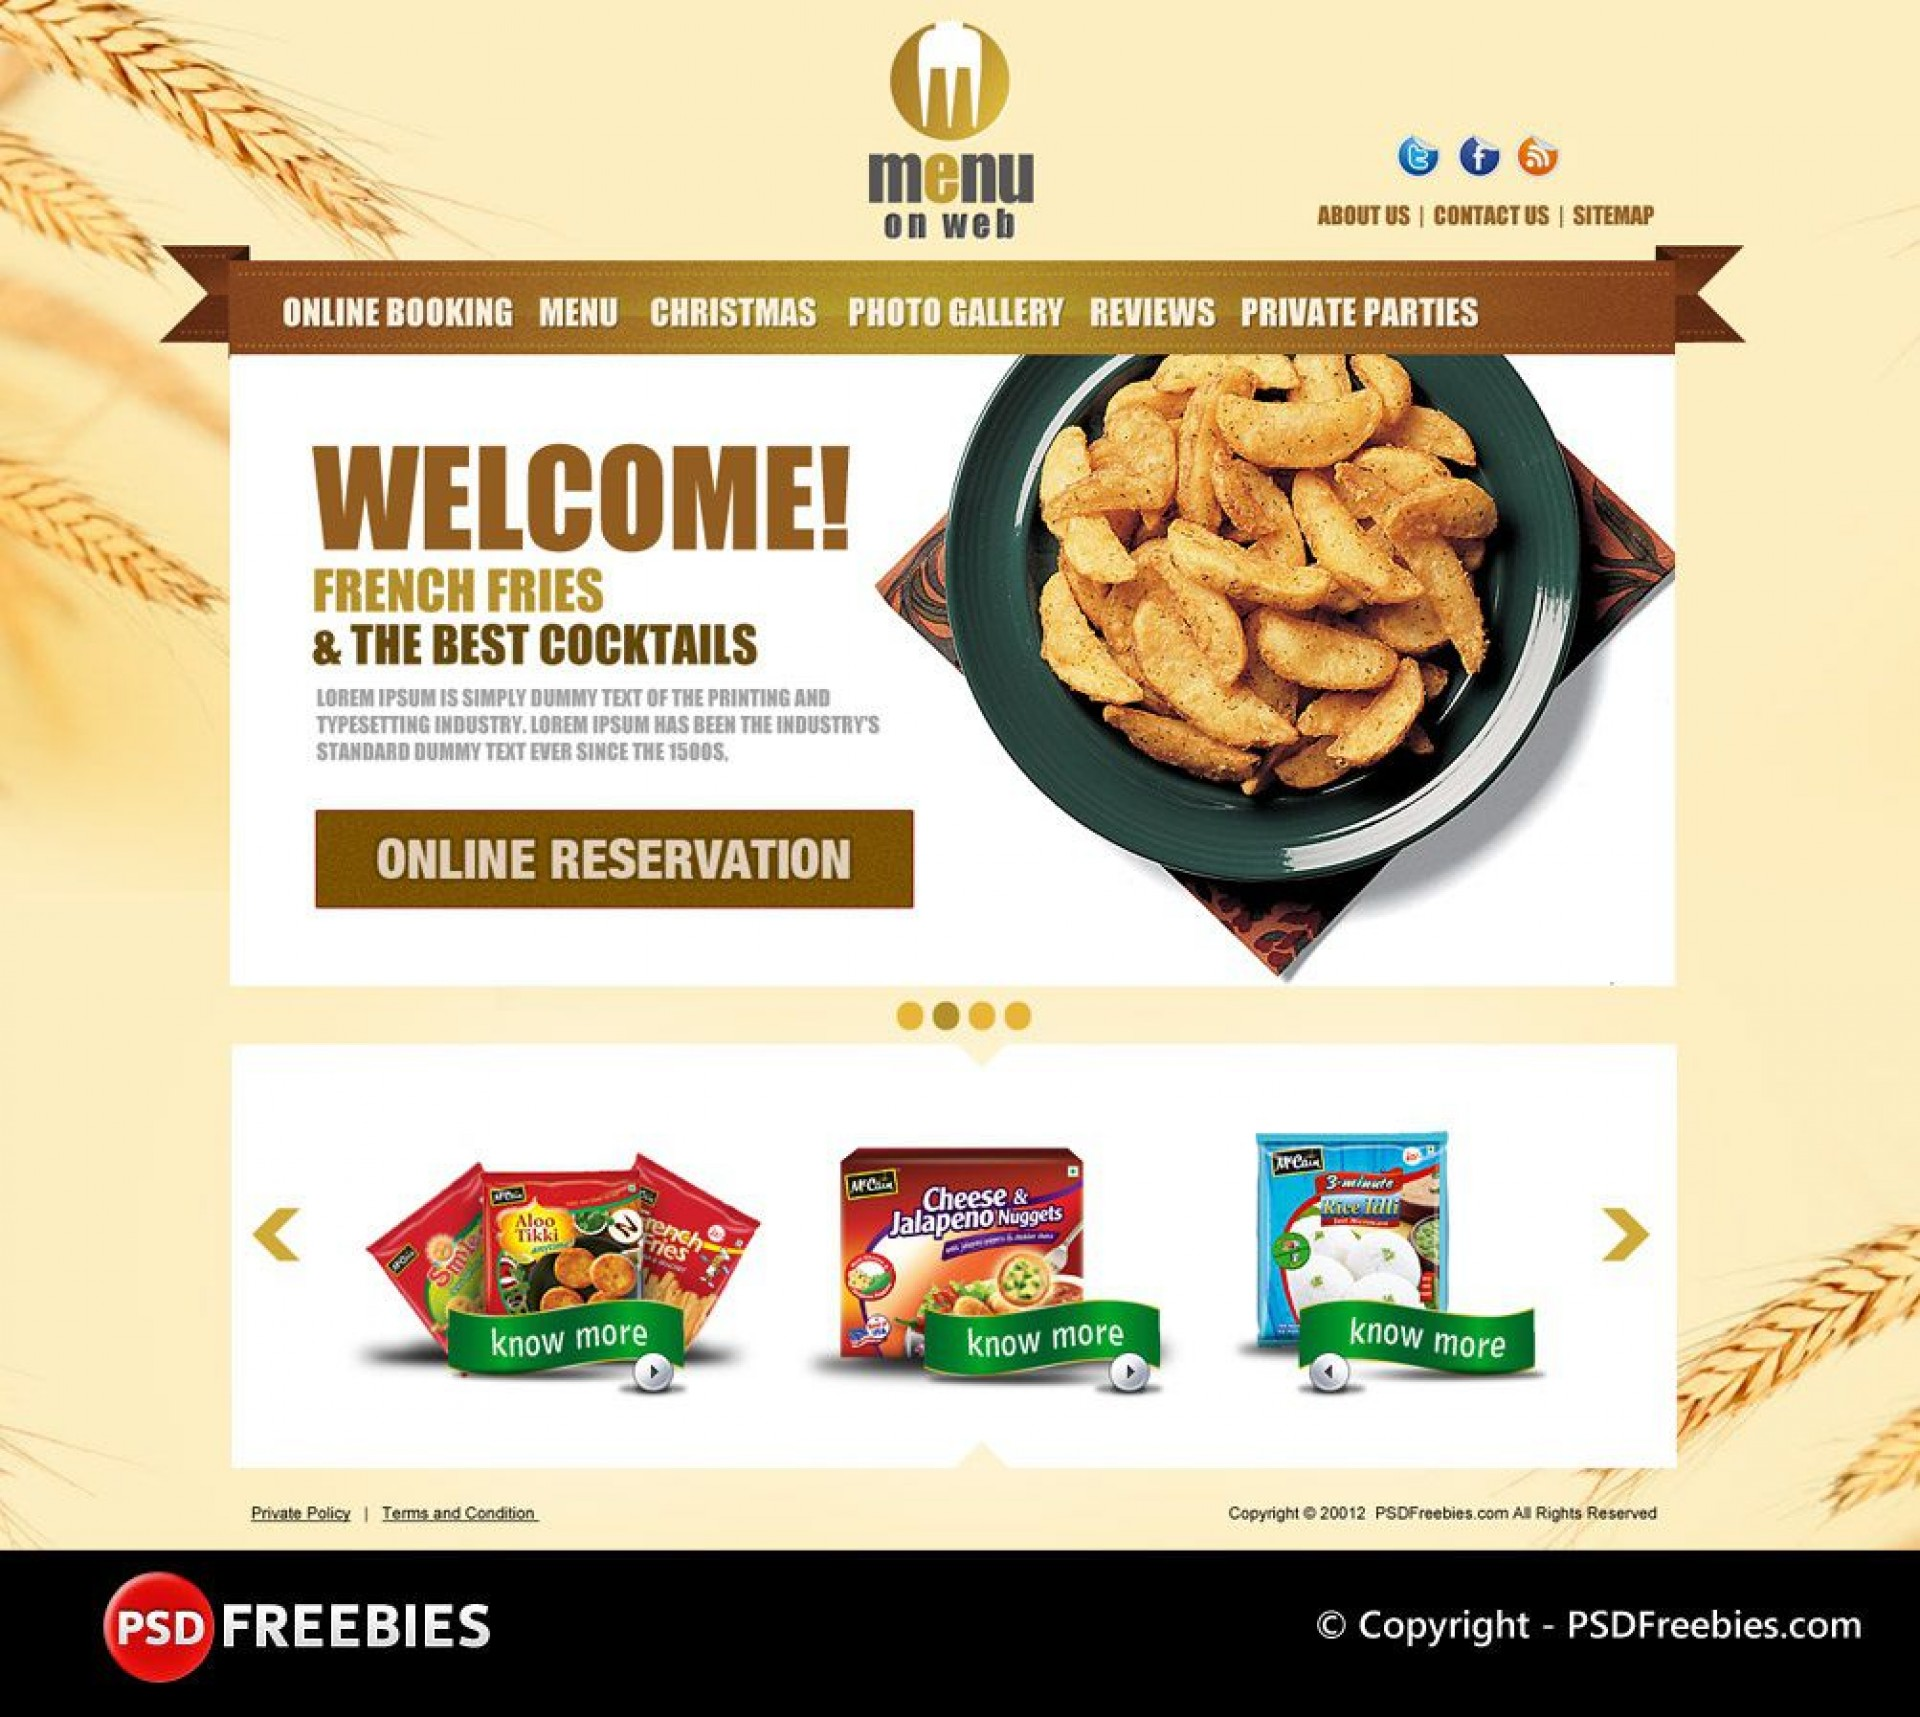 005 Fascinating Restaurant Menu Template Free Download Psd Photo  Design1920